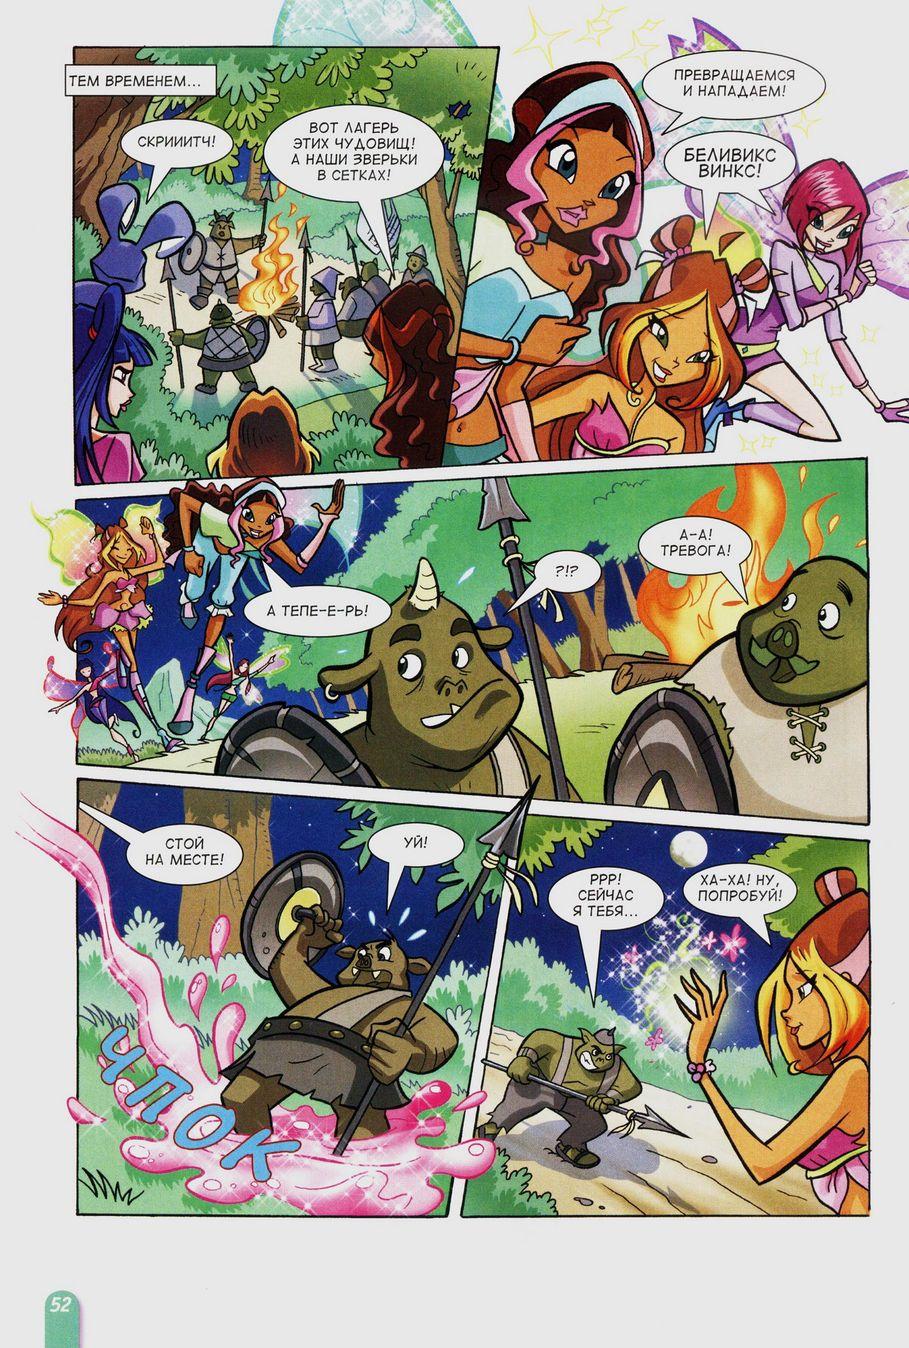 Комикс Винкс Winx - Волшебник Камуд (Журнал Винкс №6 2011) - стр. 52